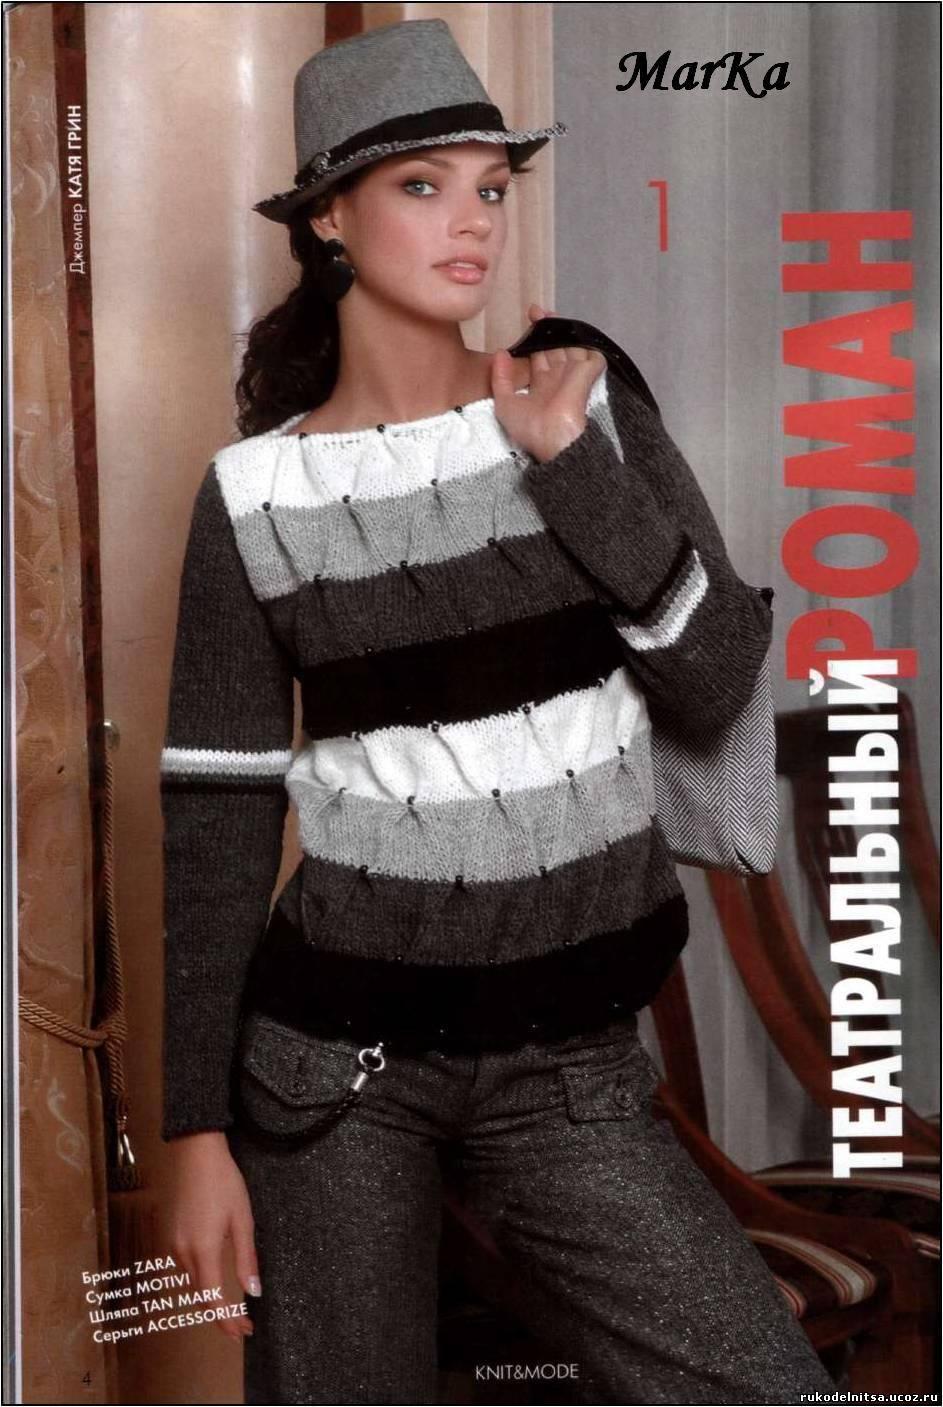 Knit and mode вязание и мода